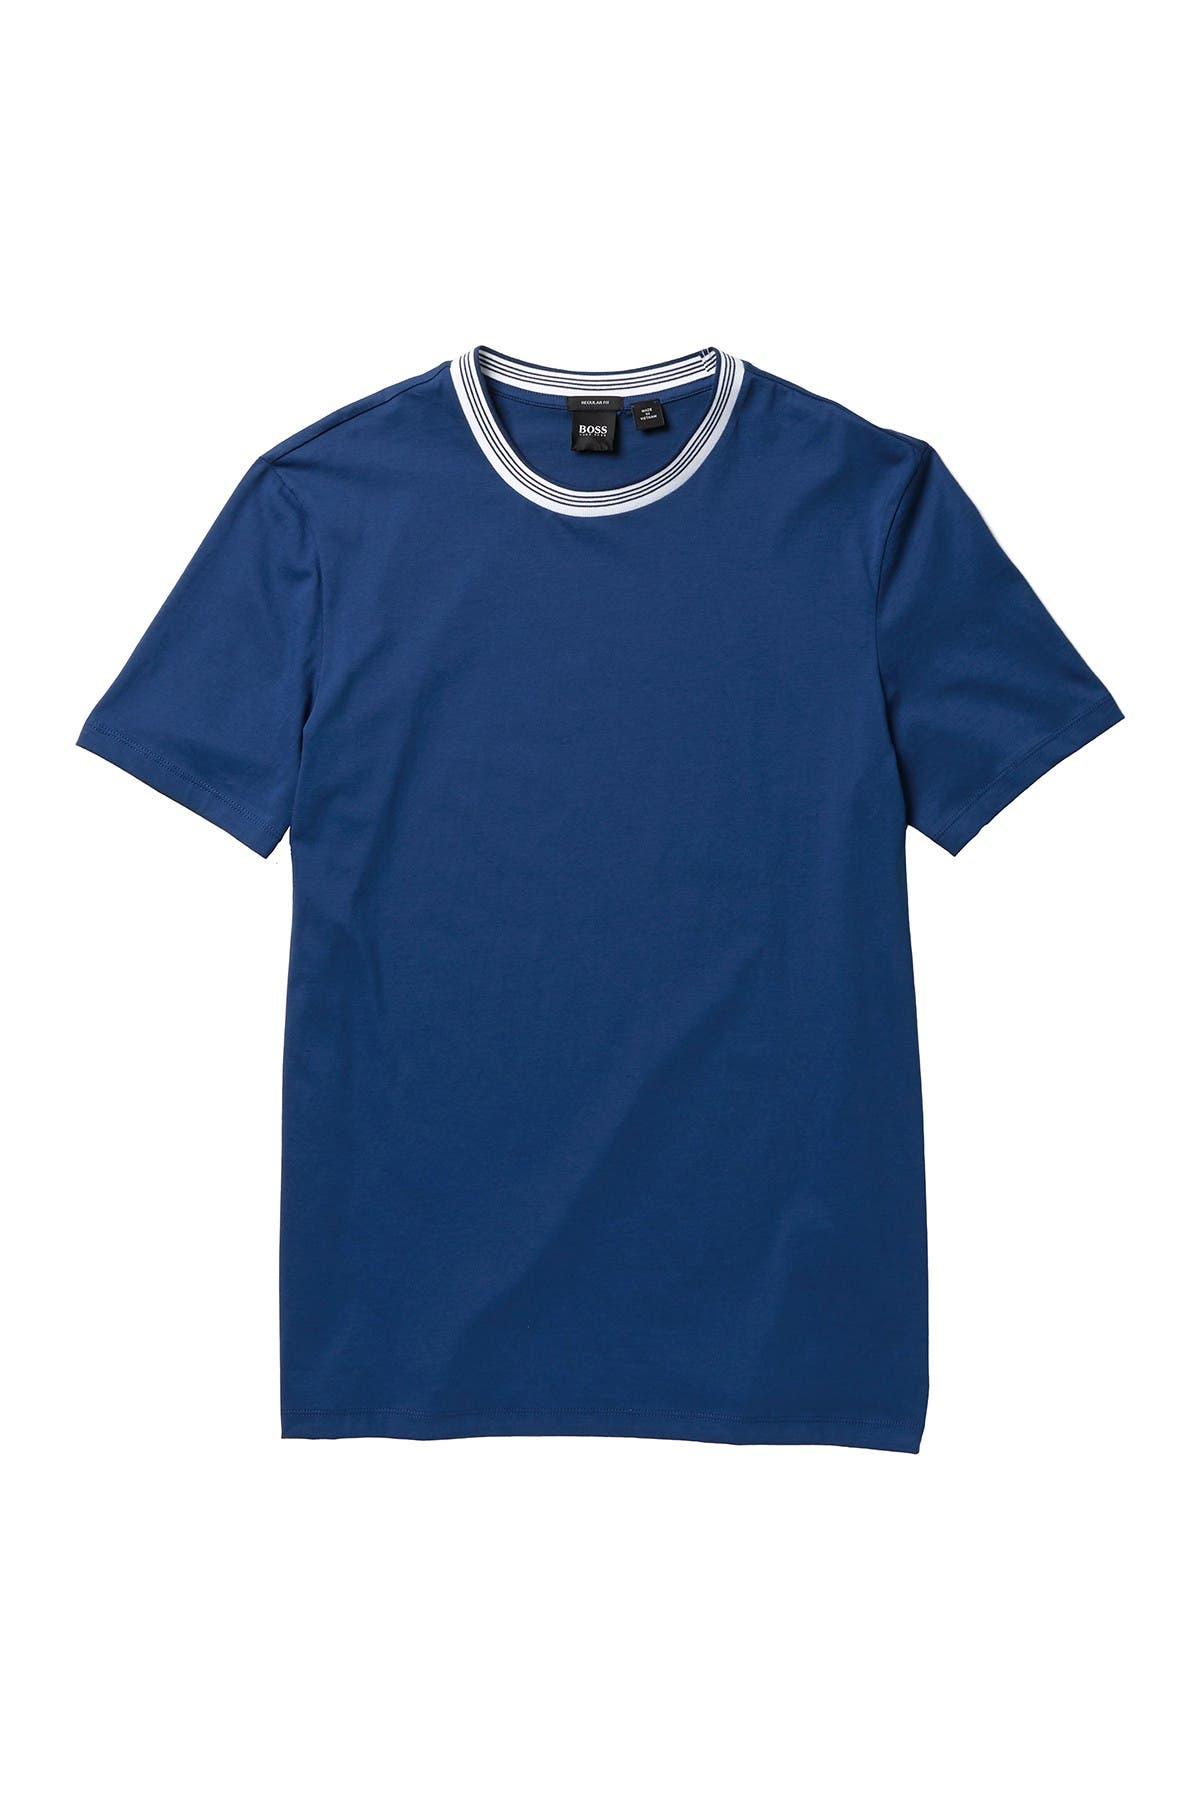 BOSS Tiburt Short Sleeve Regular Fit T-Shirt